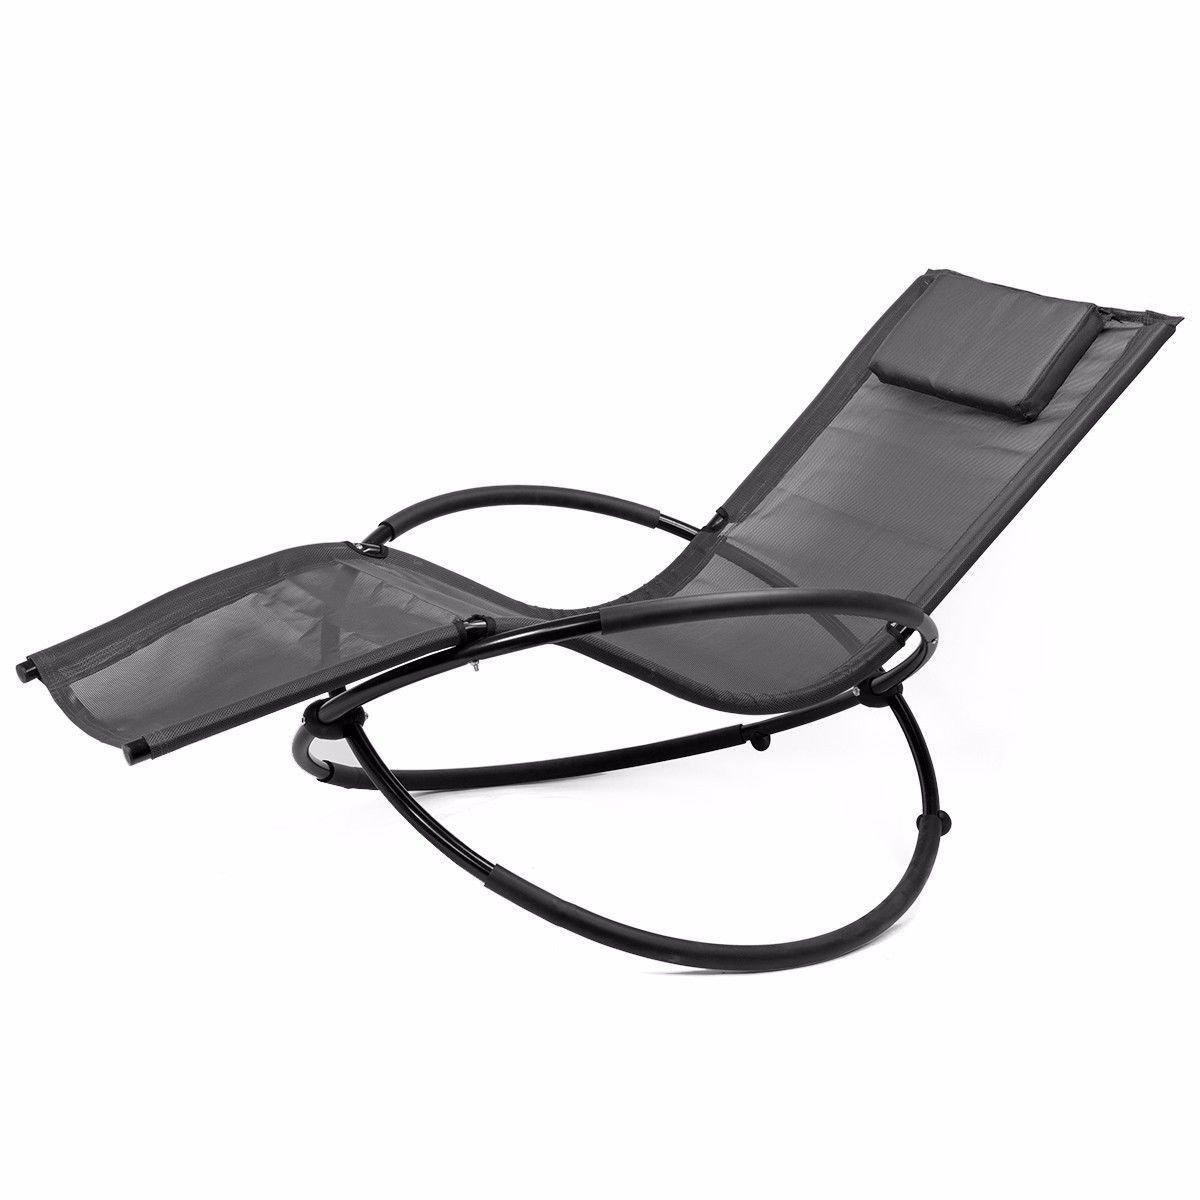 Barton Folding Orbit Zero Gravity Chair Patio Armrest Padded Garden Lounger Rocking Relax Outdoor, Gray by Barton